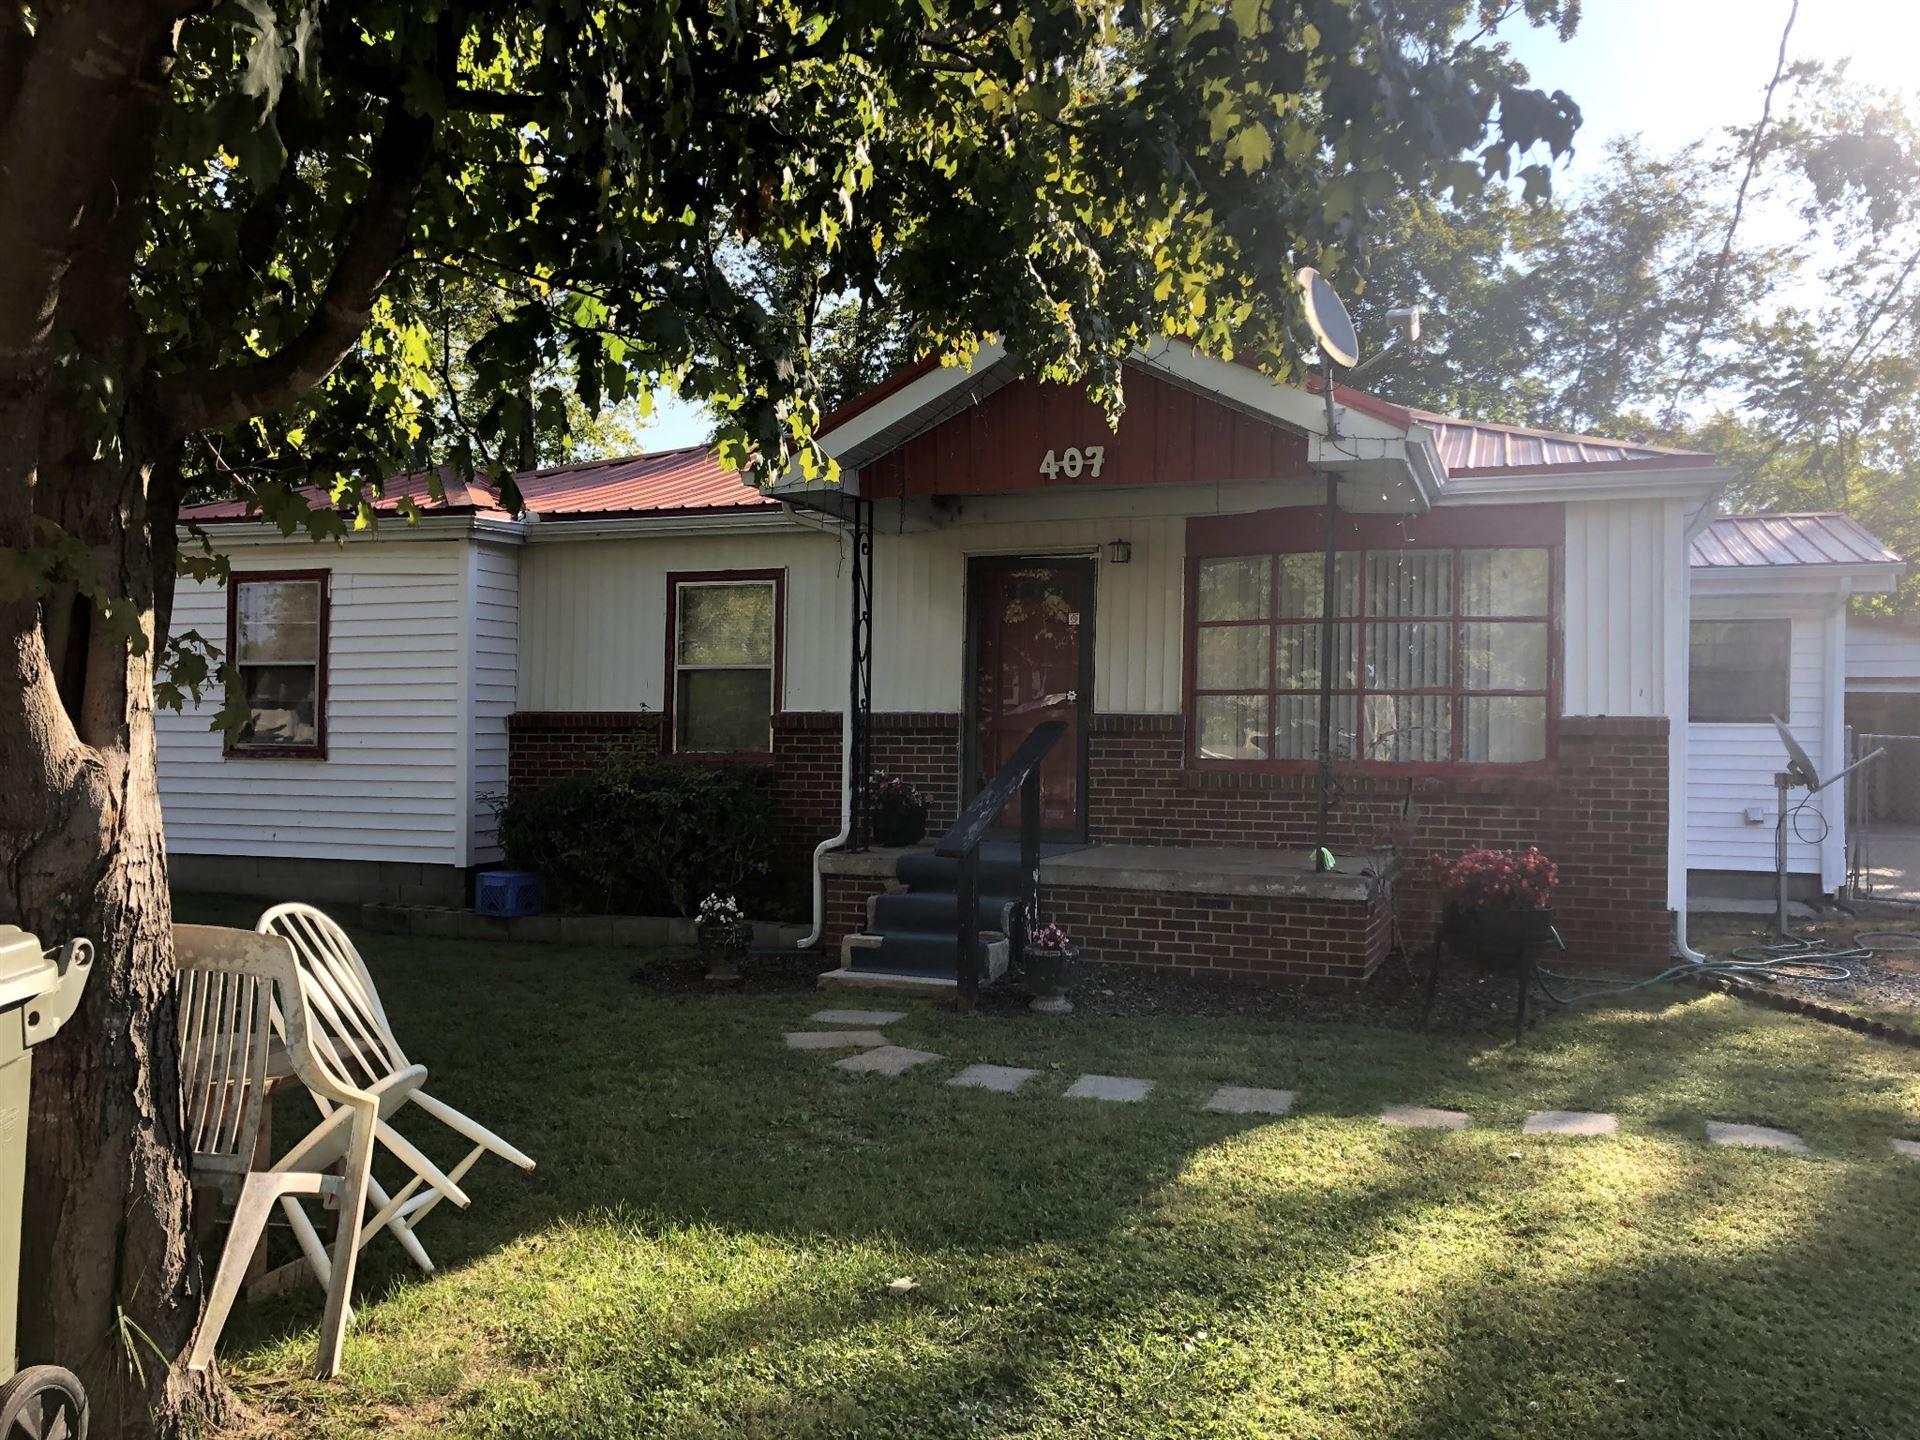 407 Magnolia St, Gallatin, TN 37066 - MLS#: 2198036